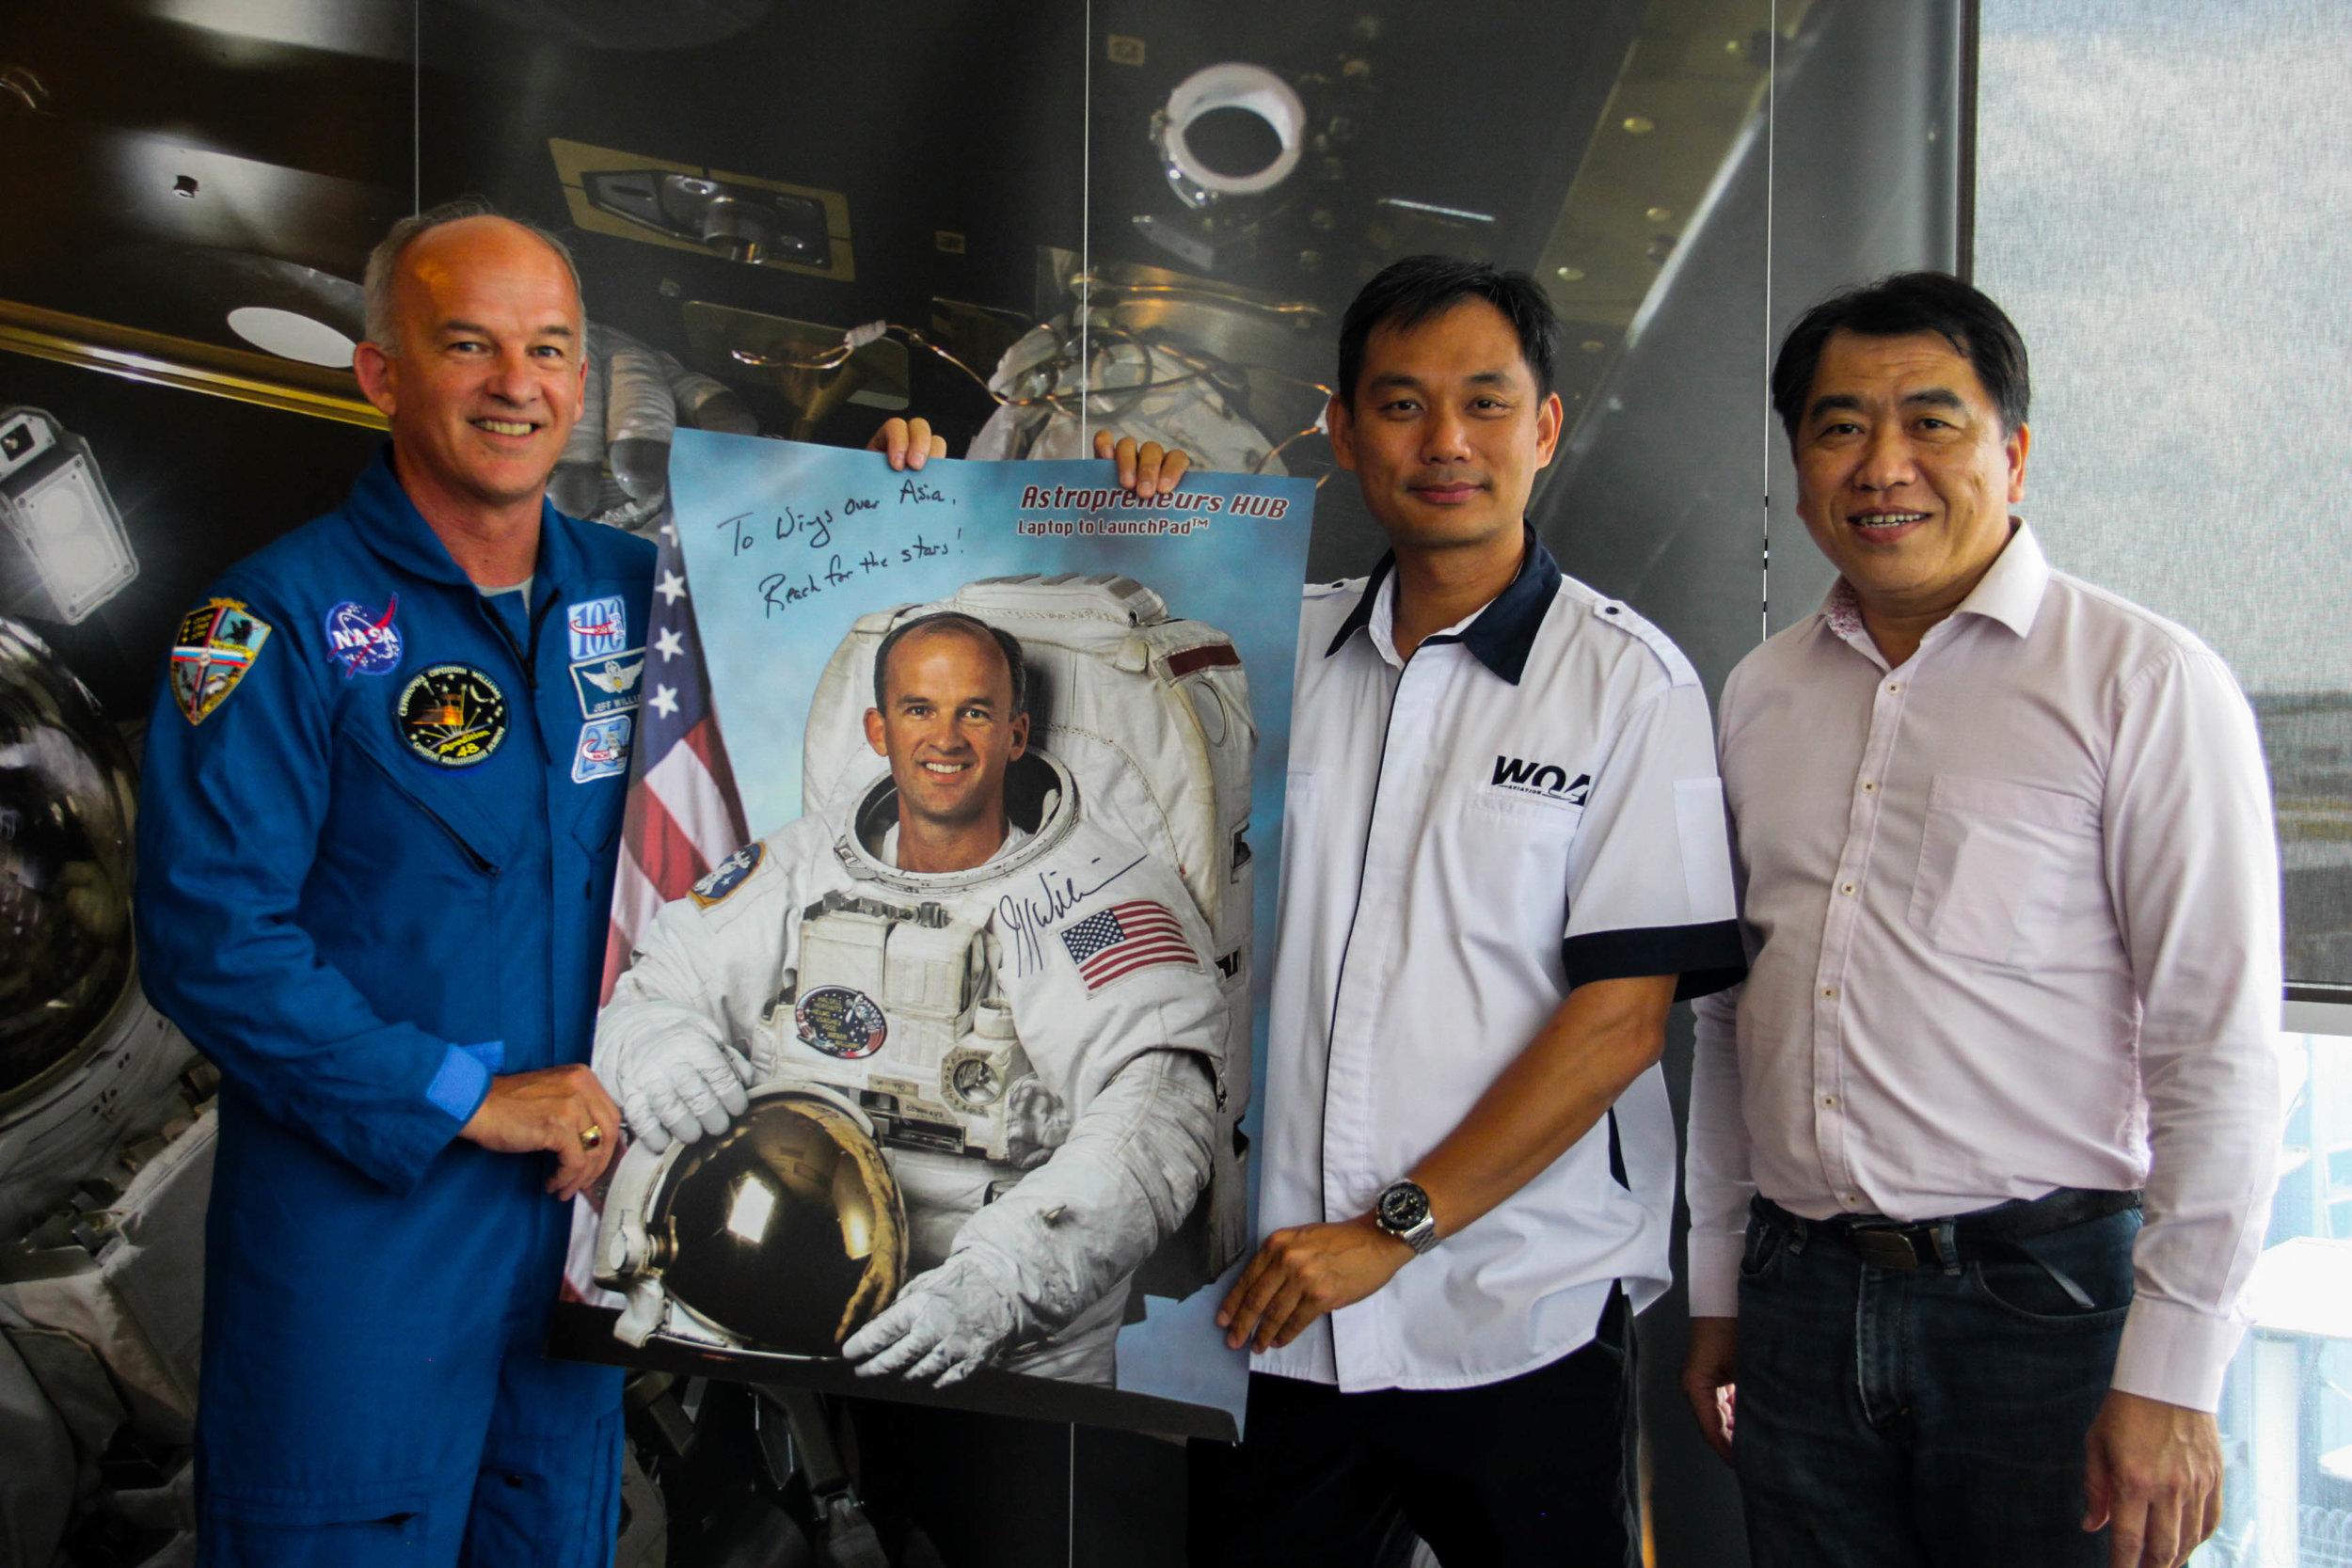 Meet NASA Astronaut & Reach for the Stars!